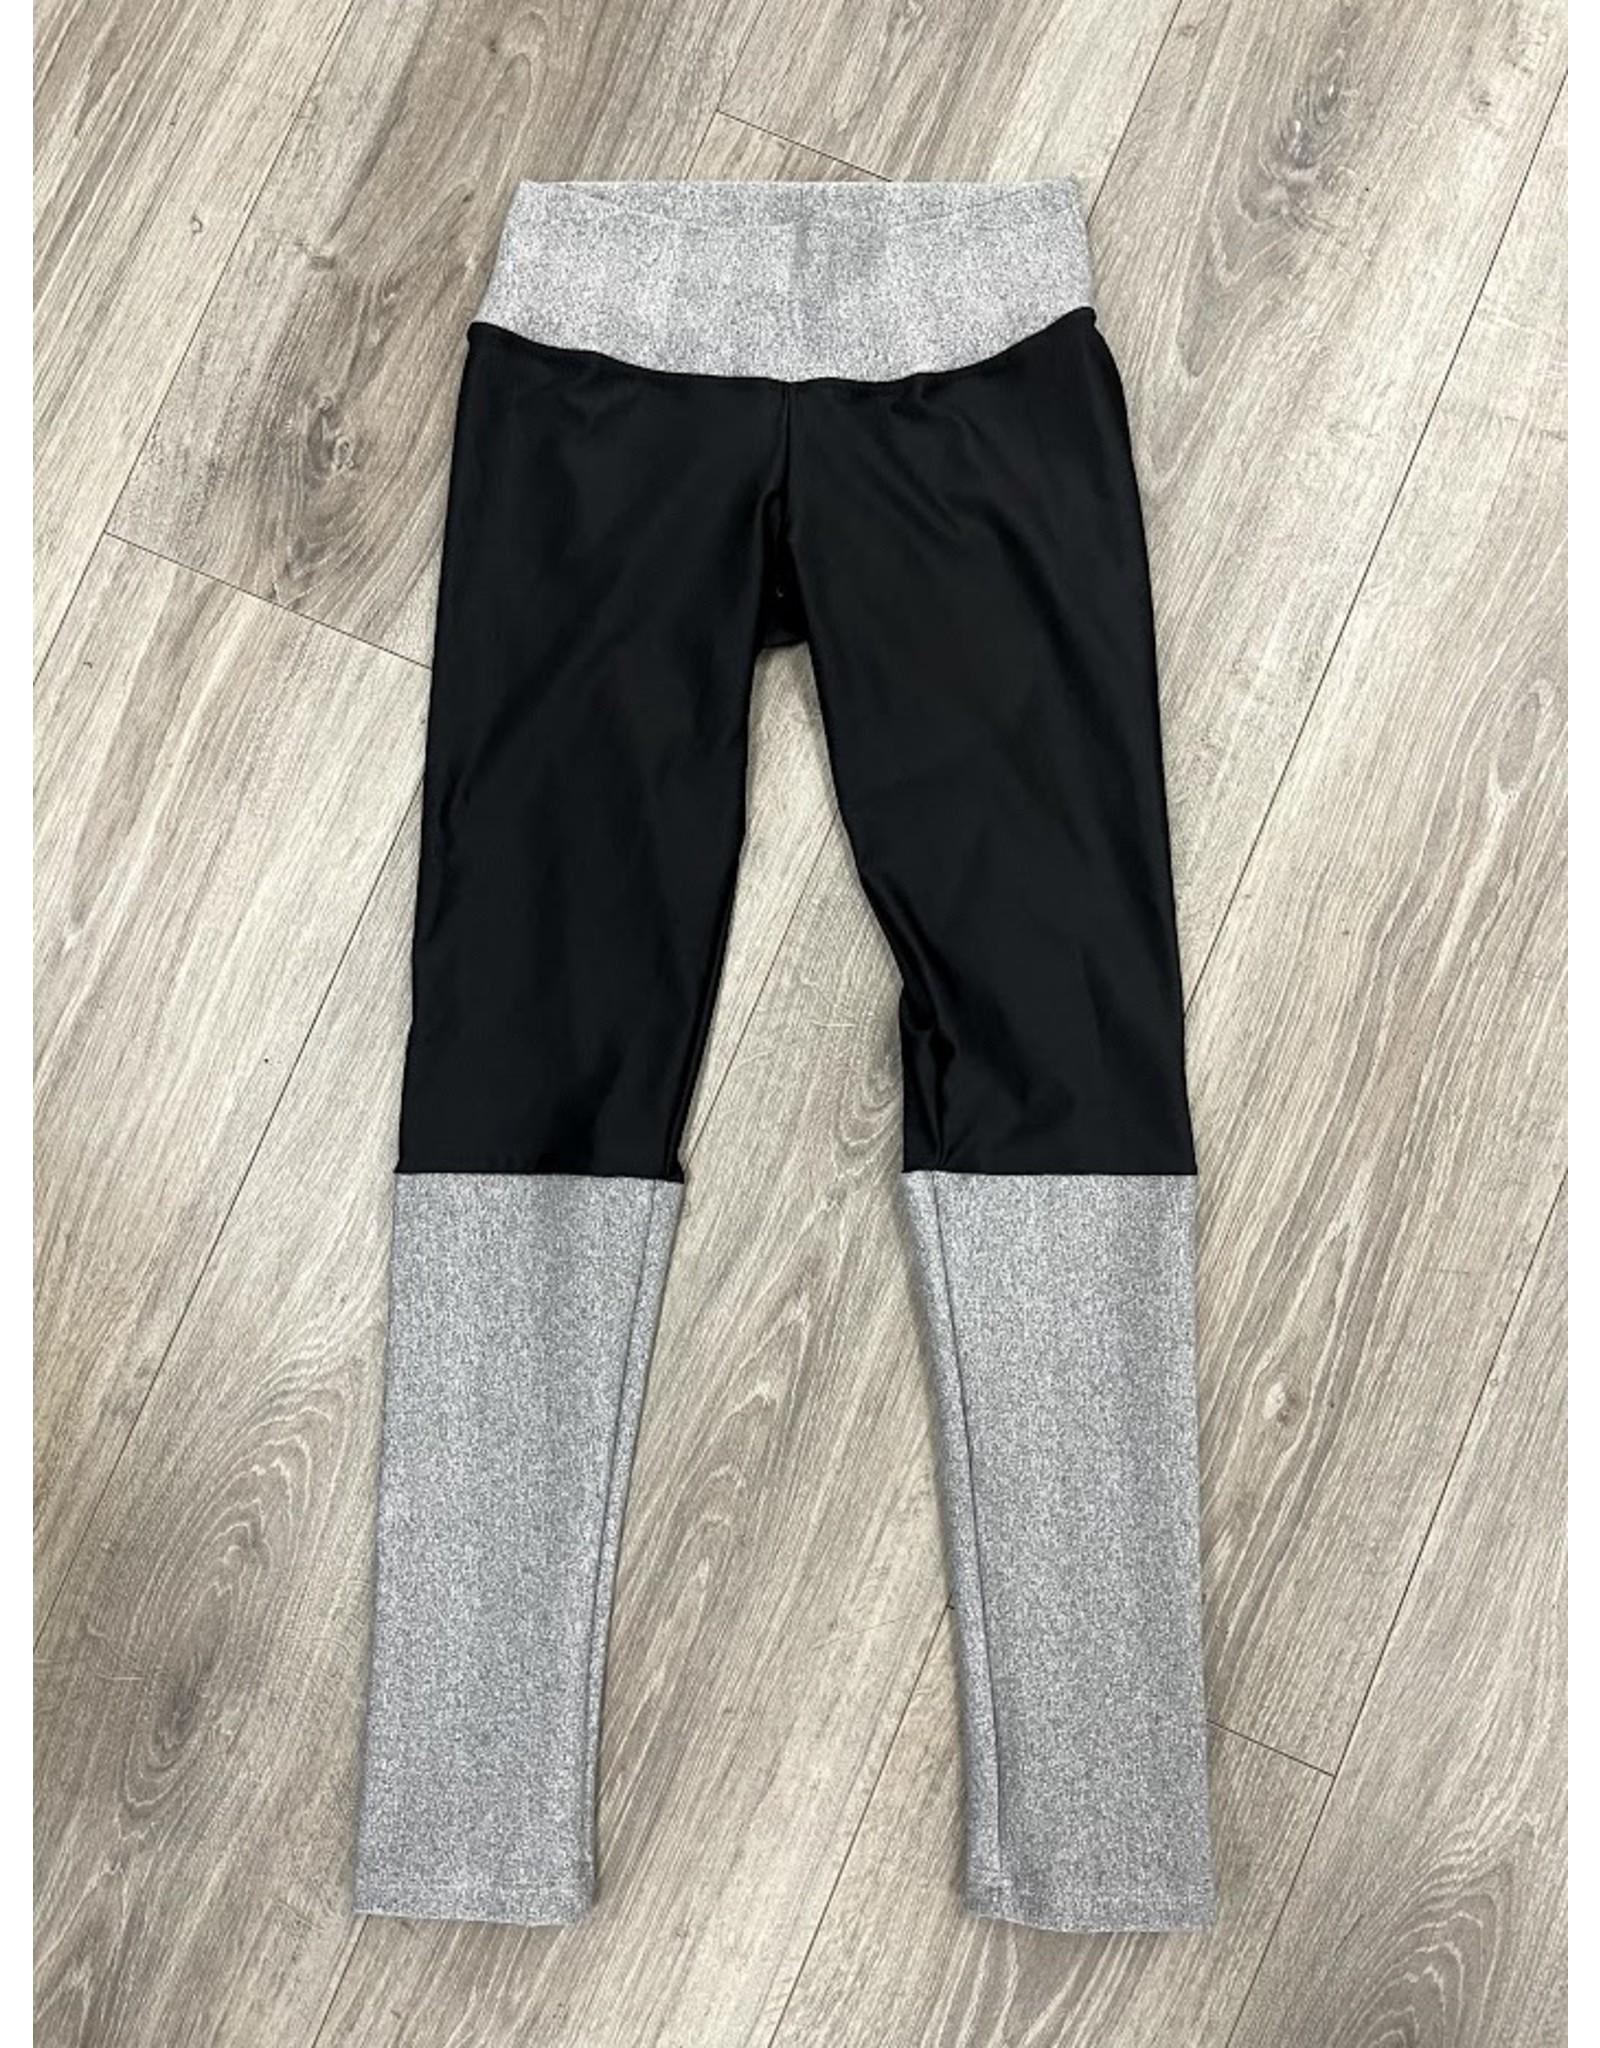 Alejandra Lujan Alejandra Lujan Black/Grey Leggings